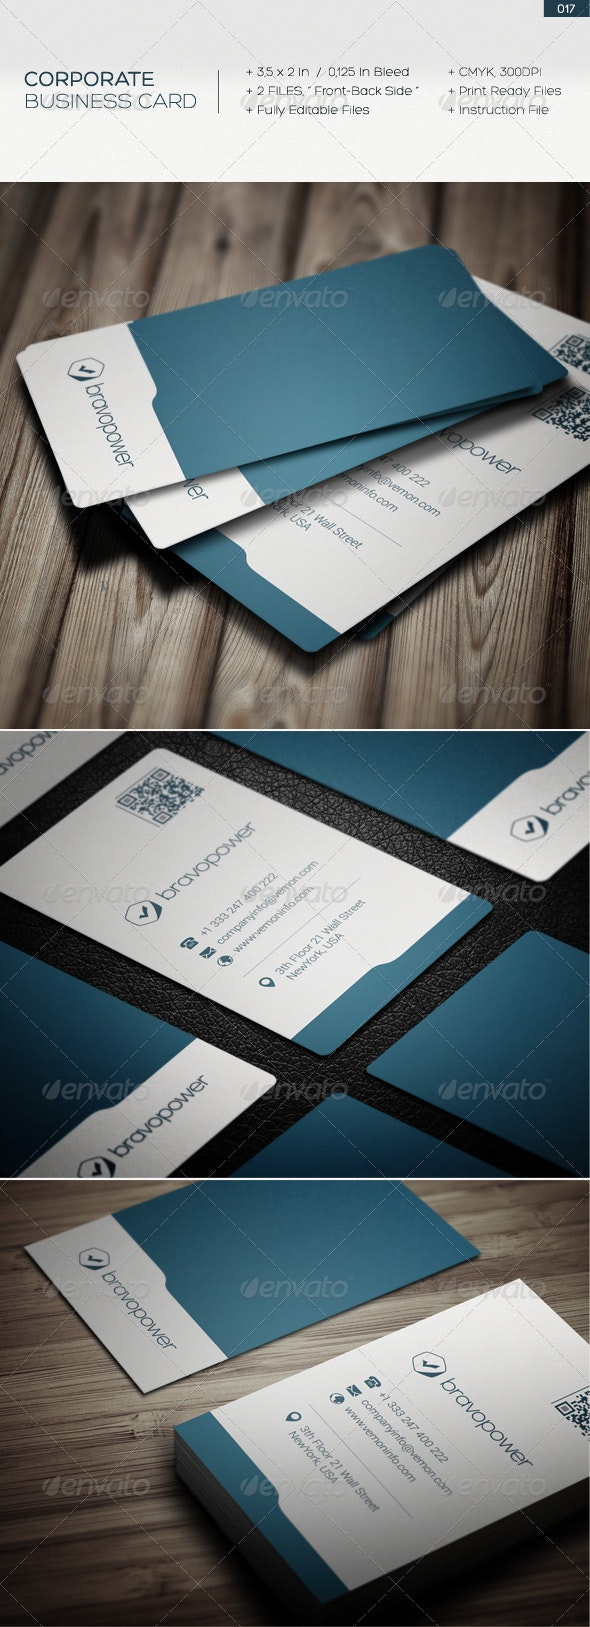 Corporate business card 017 - Corporate Business Cards